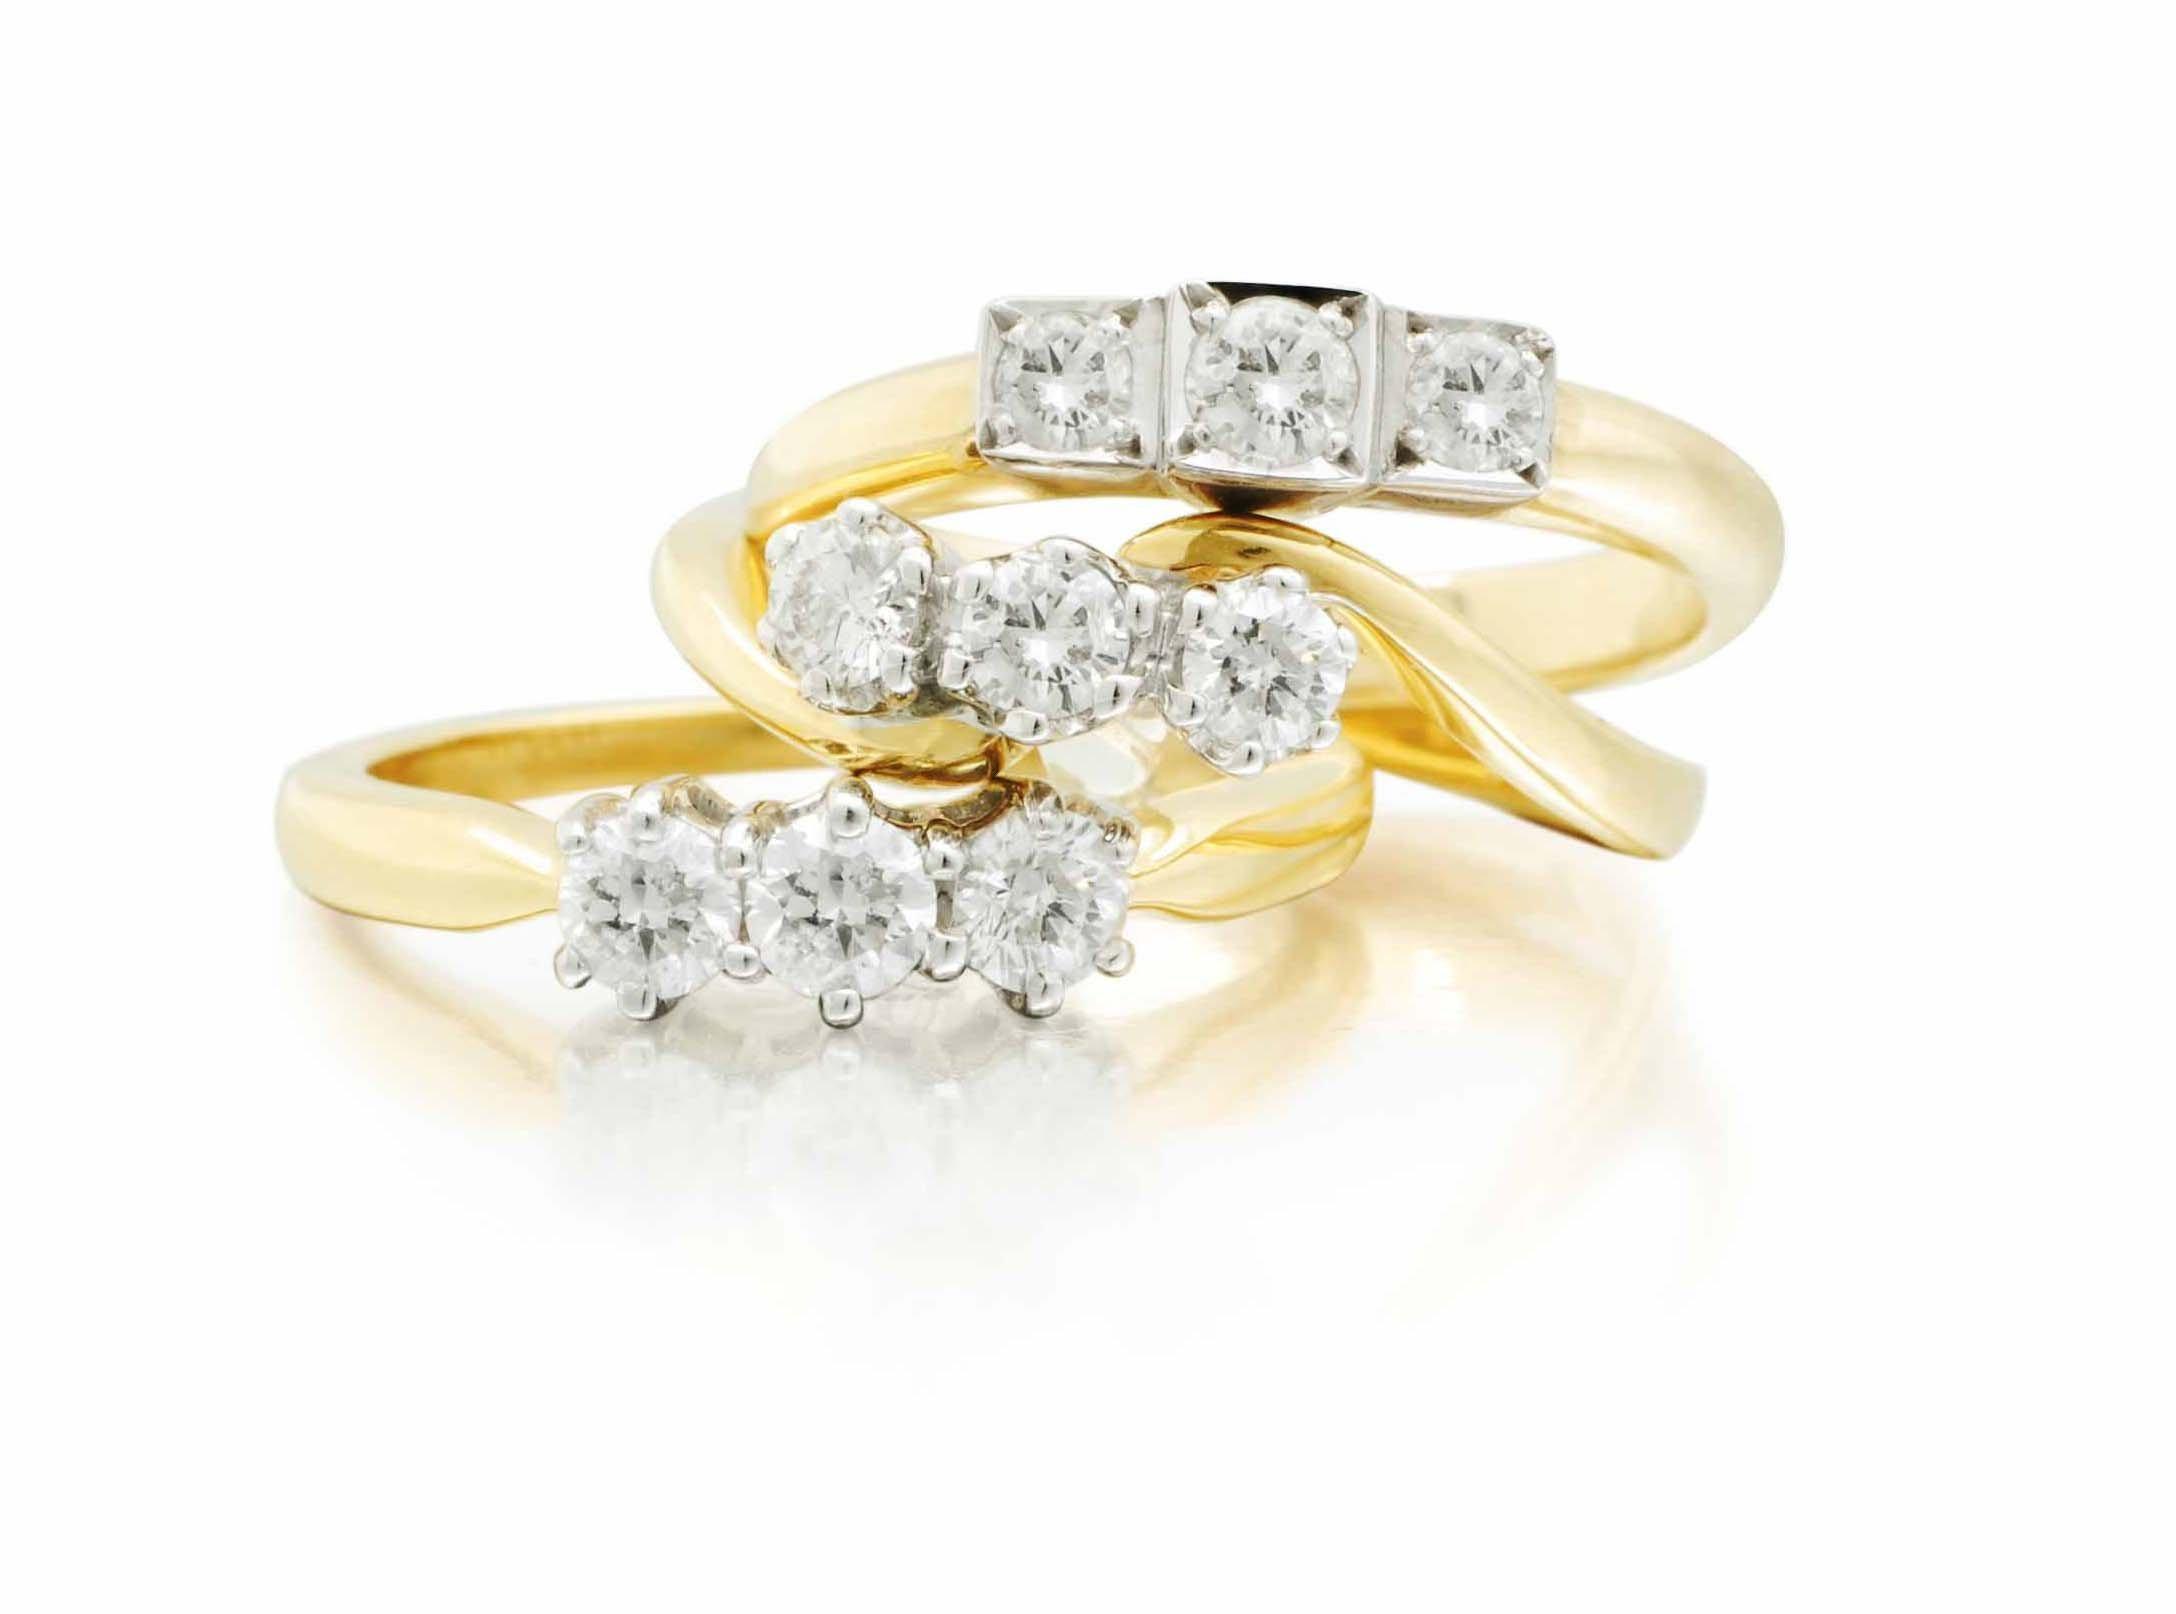 Фото бриллиантов кольца на свадьбу